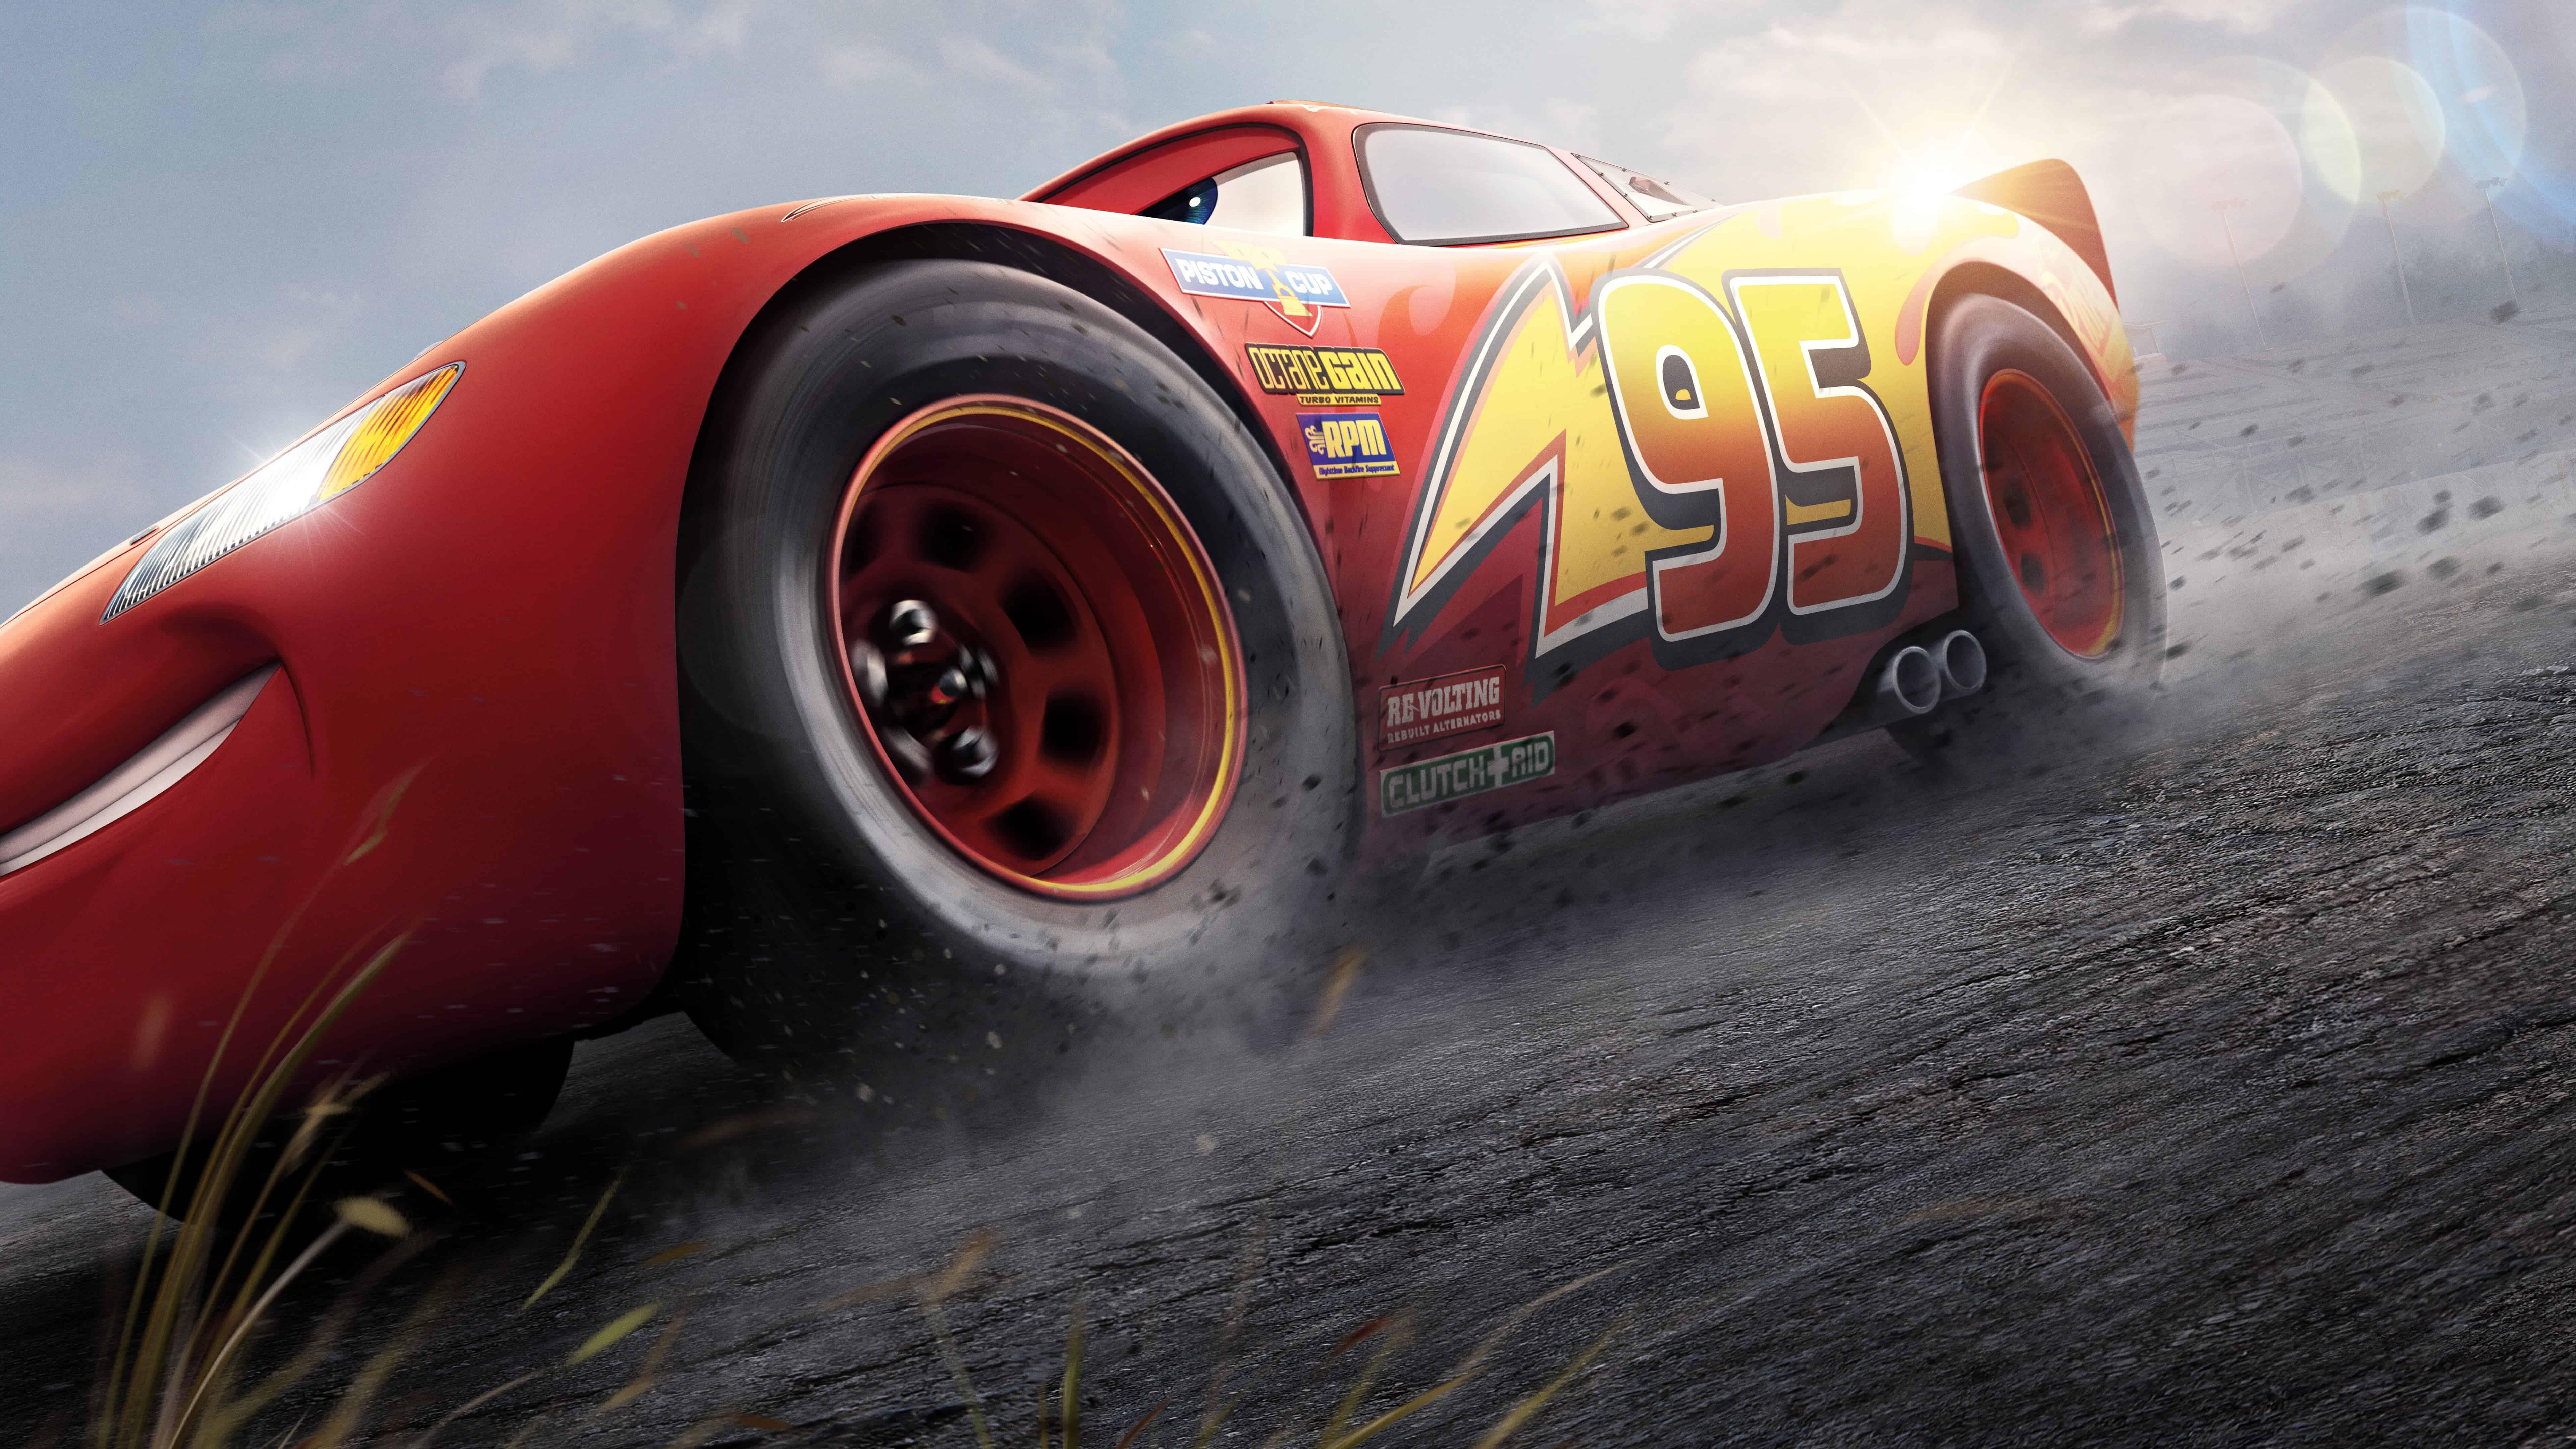 Pics Of Cars Wallpapers Cars 3 Lightning Mcqueen Uhd 8k Wallpaper Pixelz